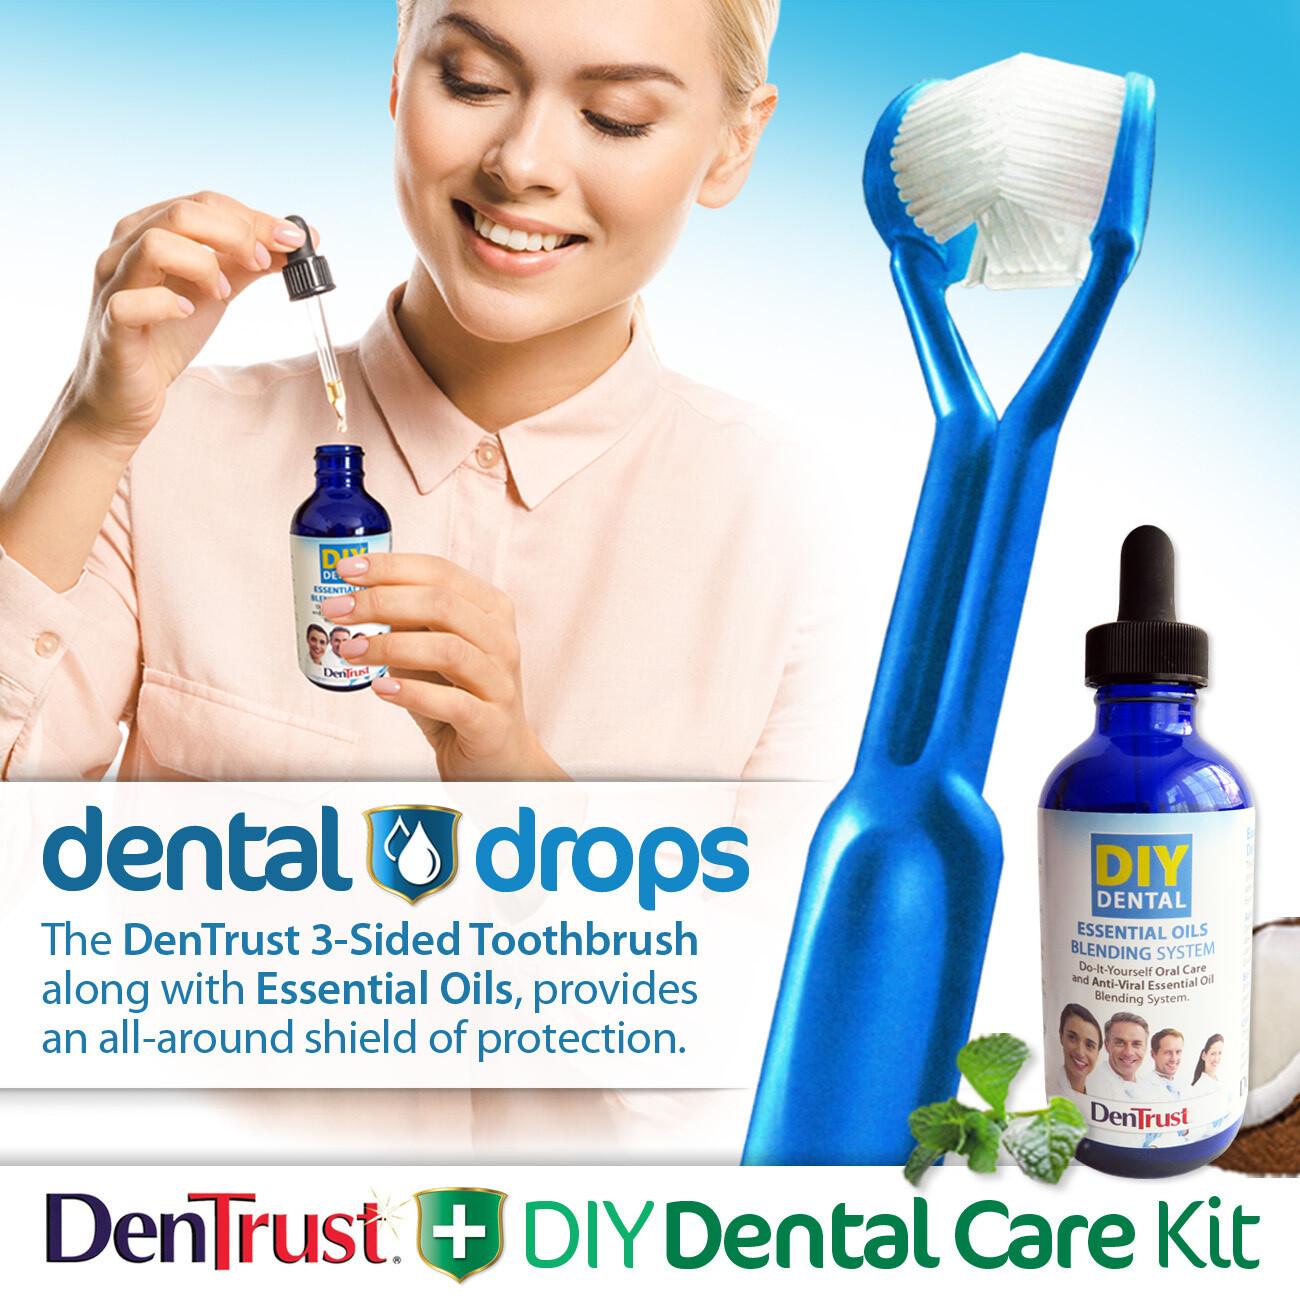 Dentrust + DIY Dental Care Kit :: Dental Drops :: Essential Oils & Coconut Oil Blending System :: Easily Prevent Gum Disease :: Antibacterial Antimicrobial